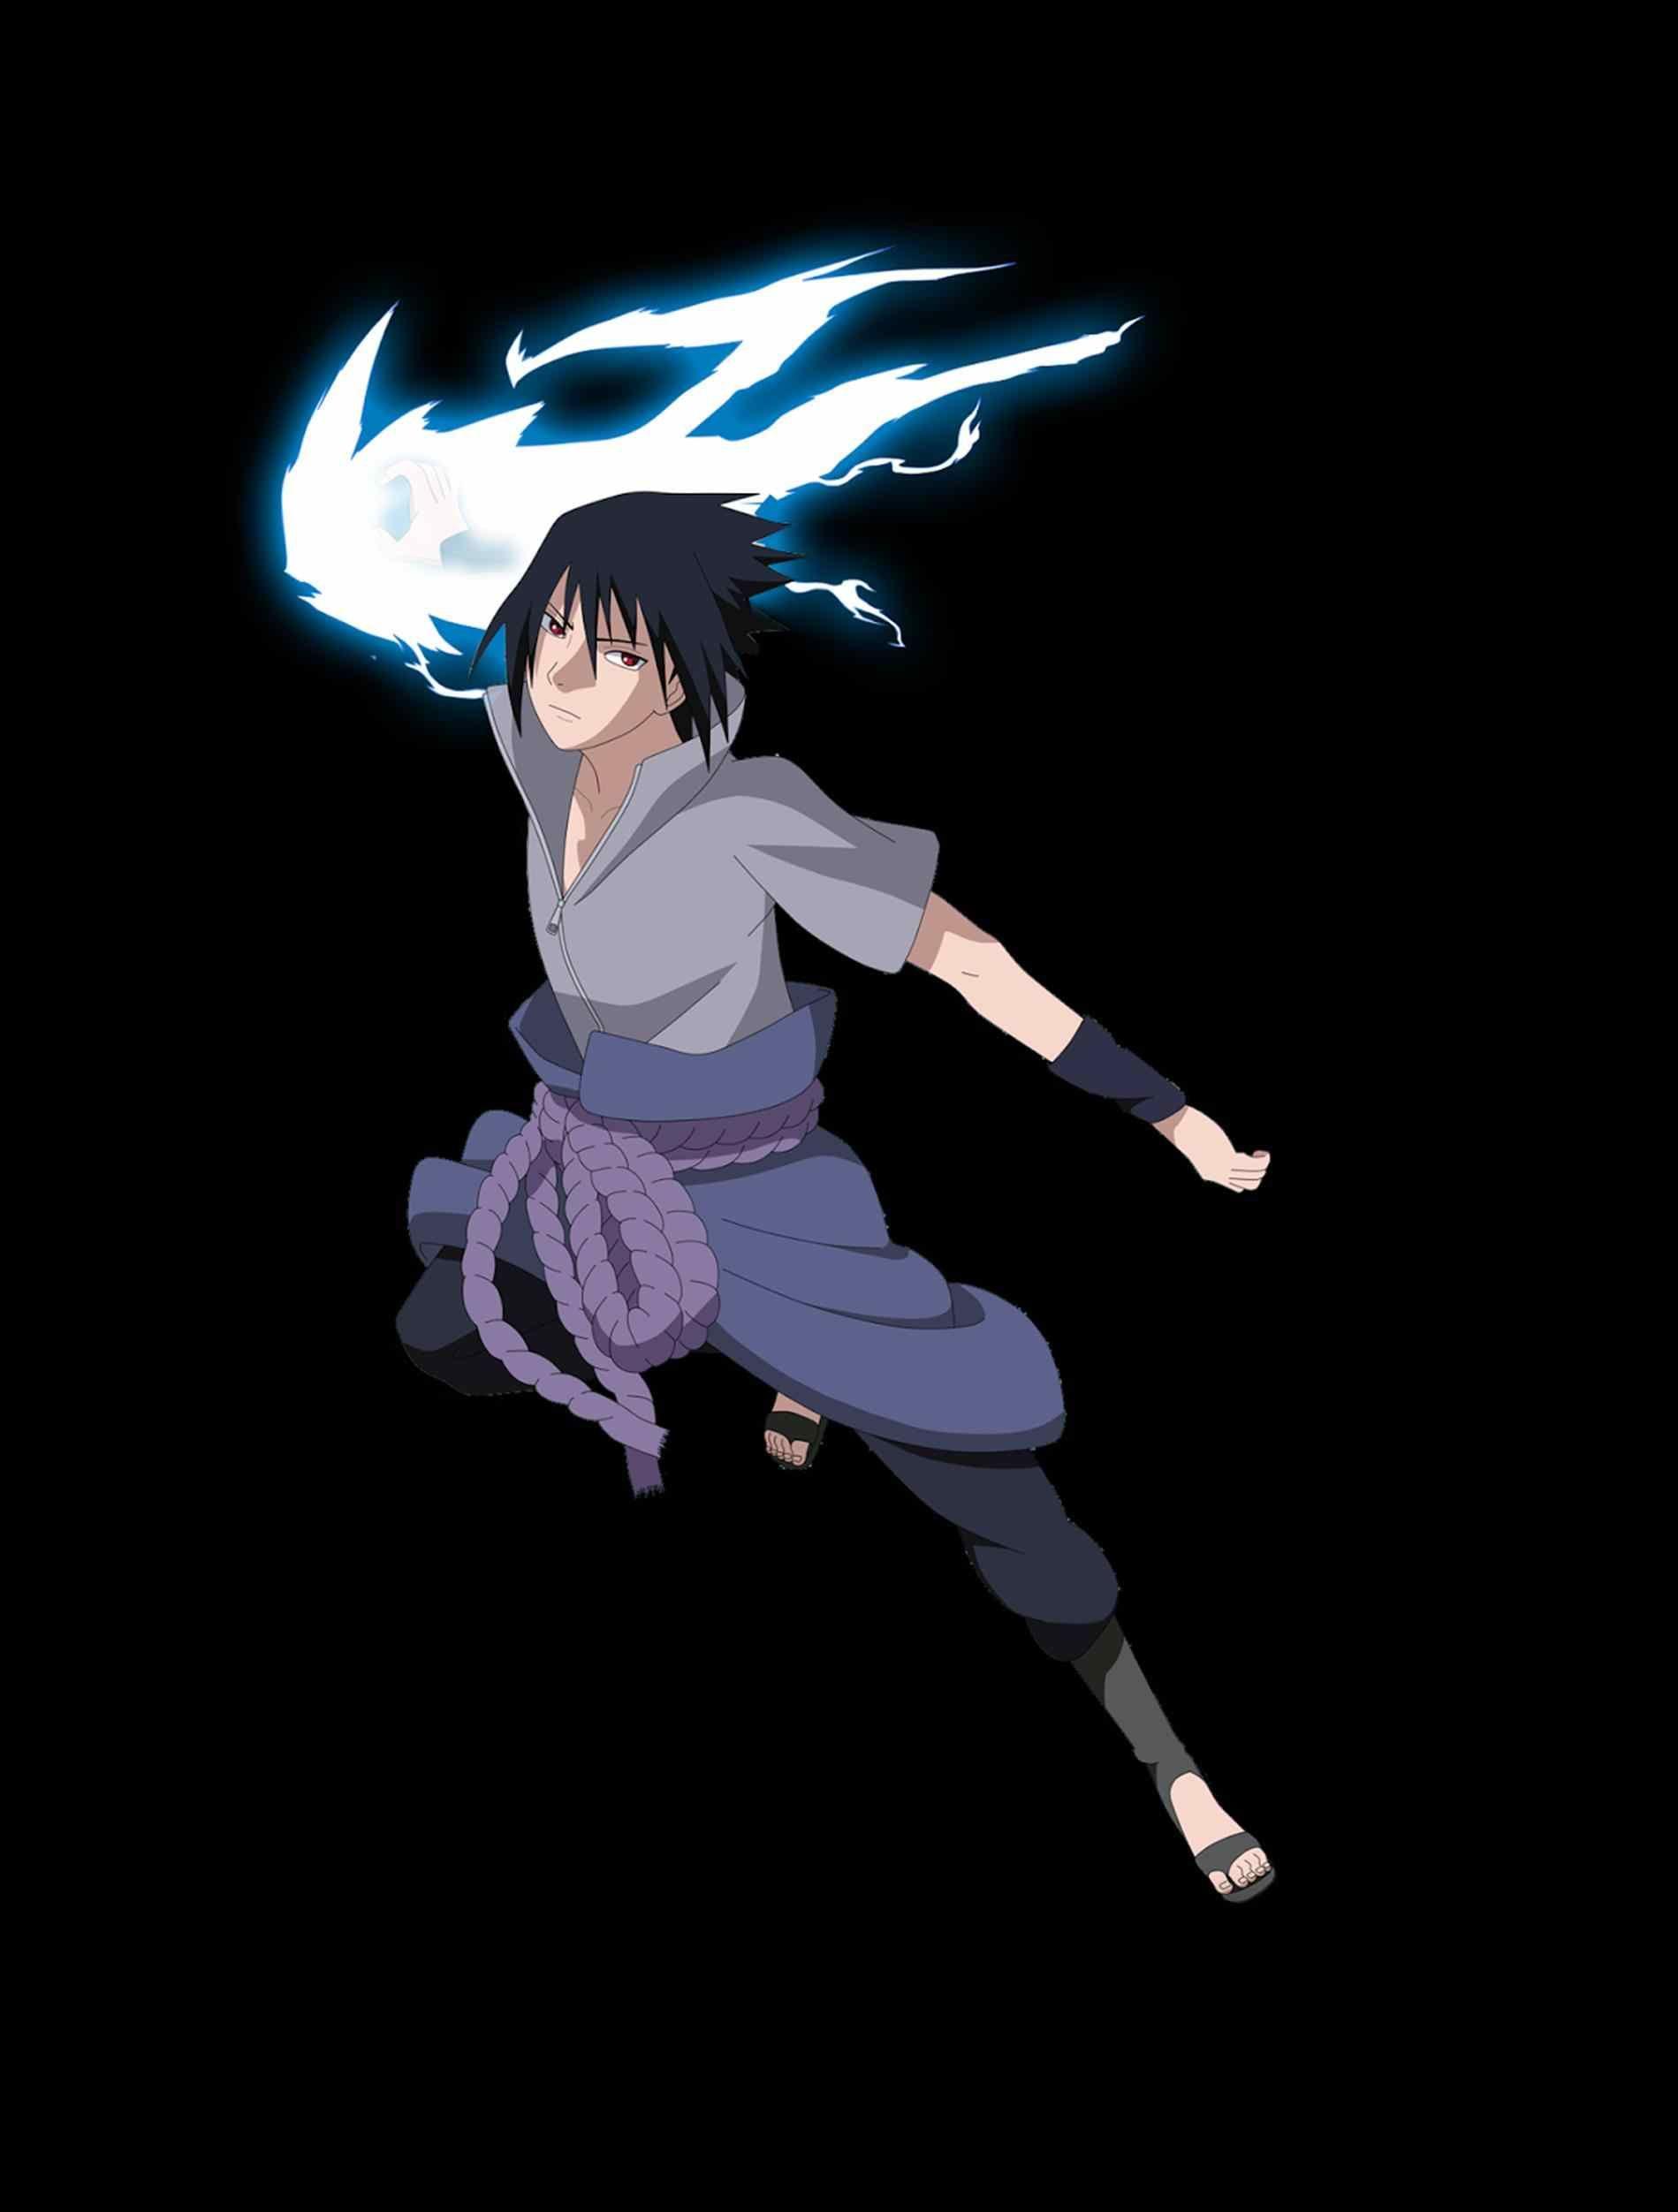 on deviantart uchiha sasuke chidori transparent rikudou mode by